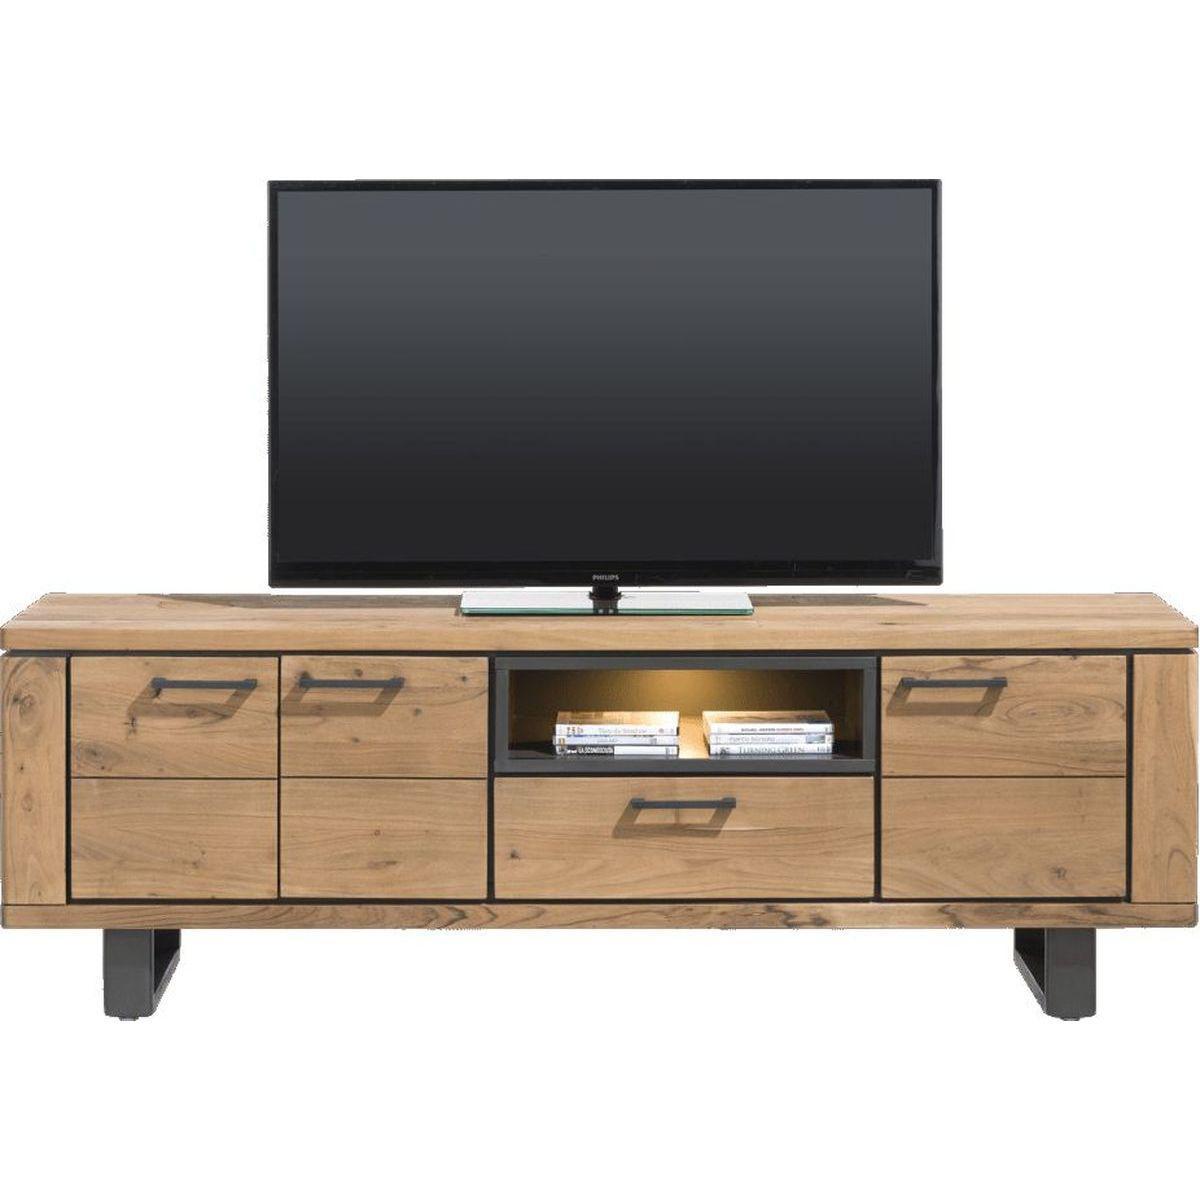 Meuble TV QUEBEC HetH 180cm pieds en métal